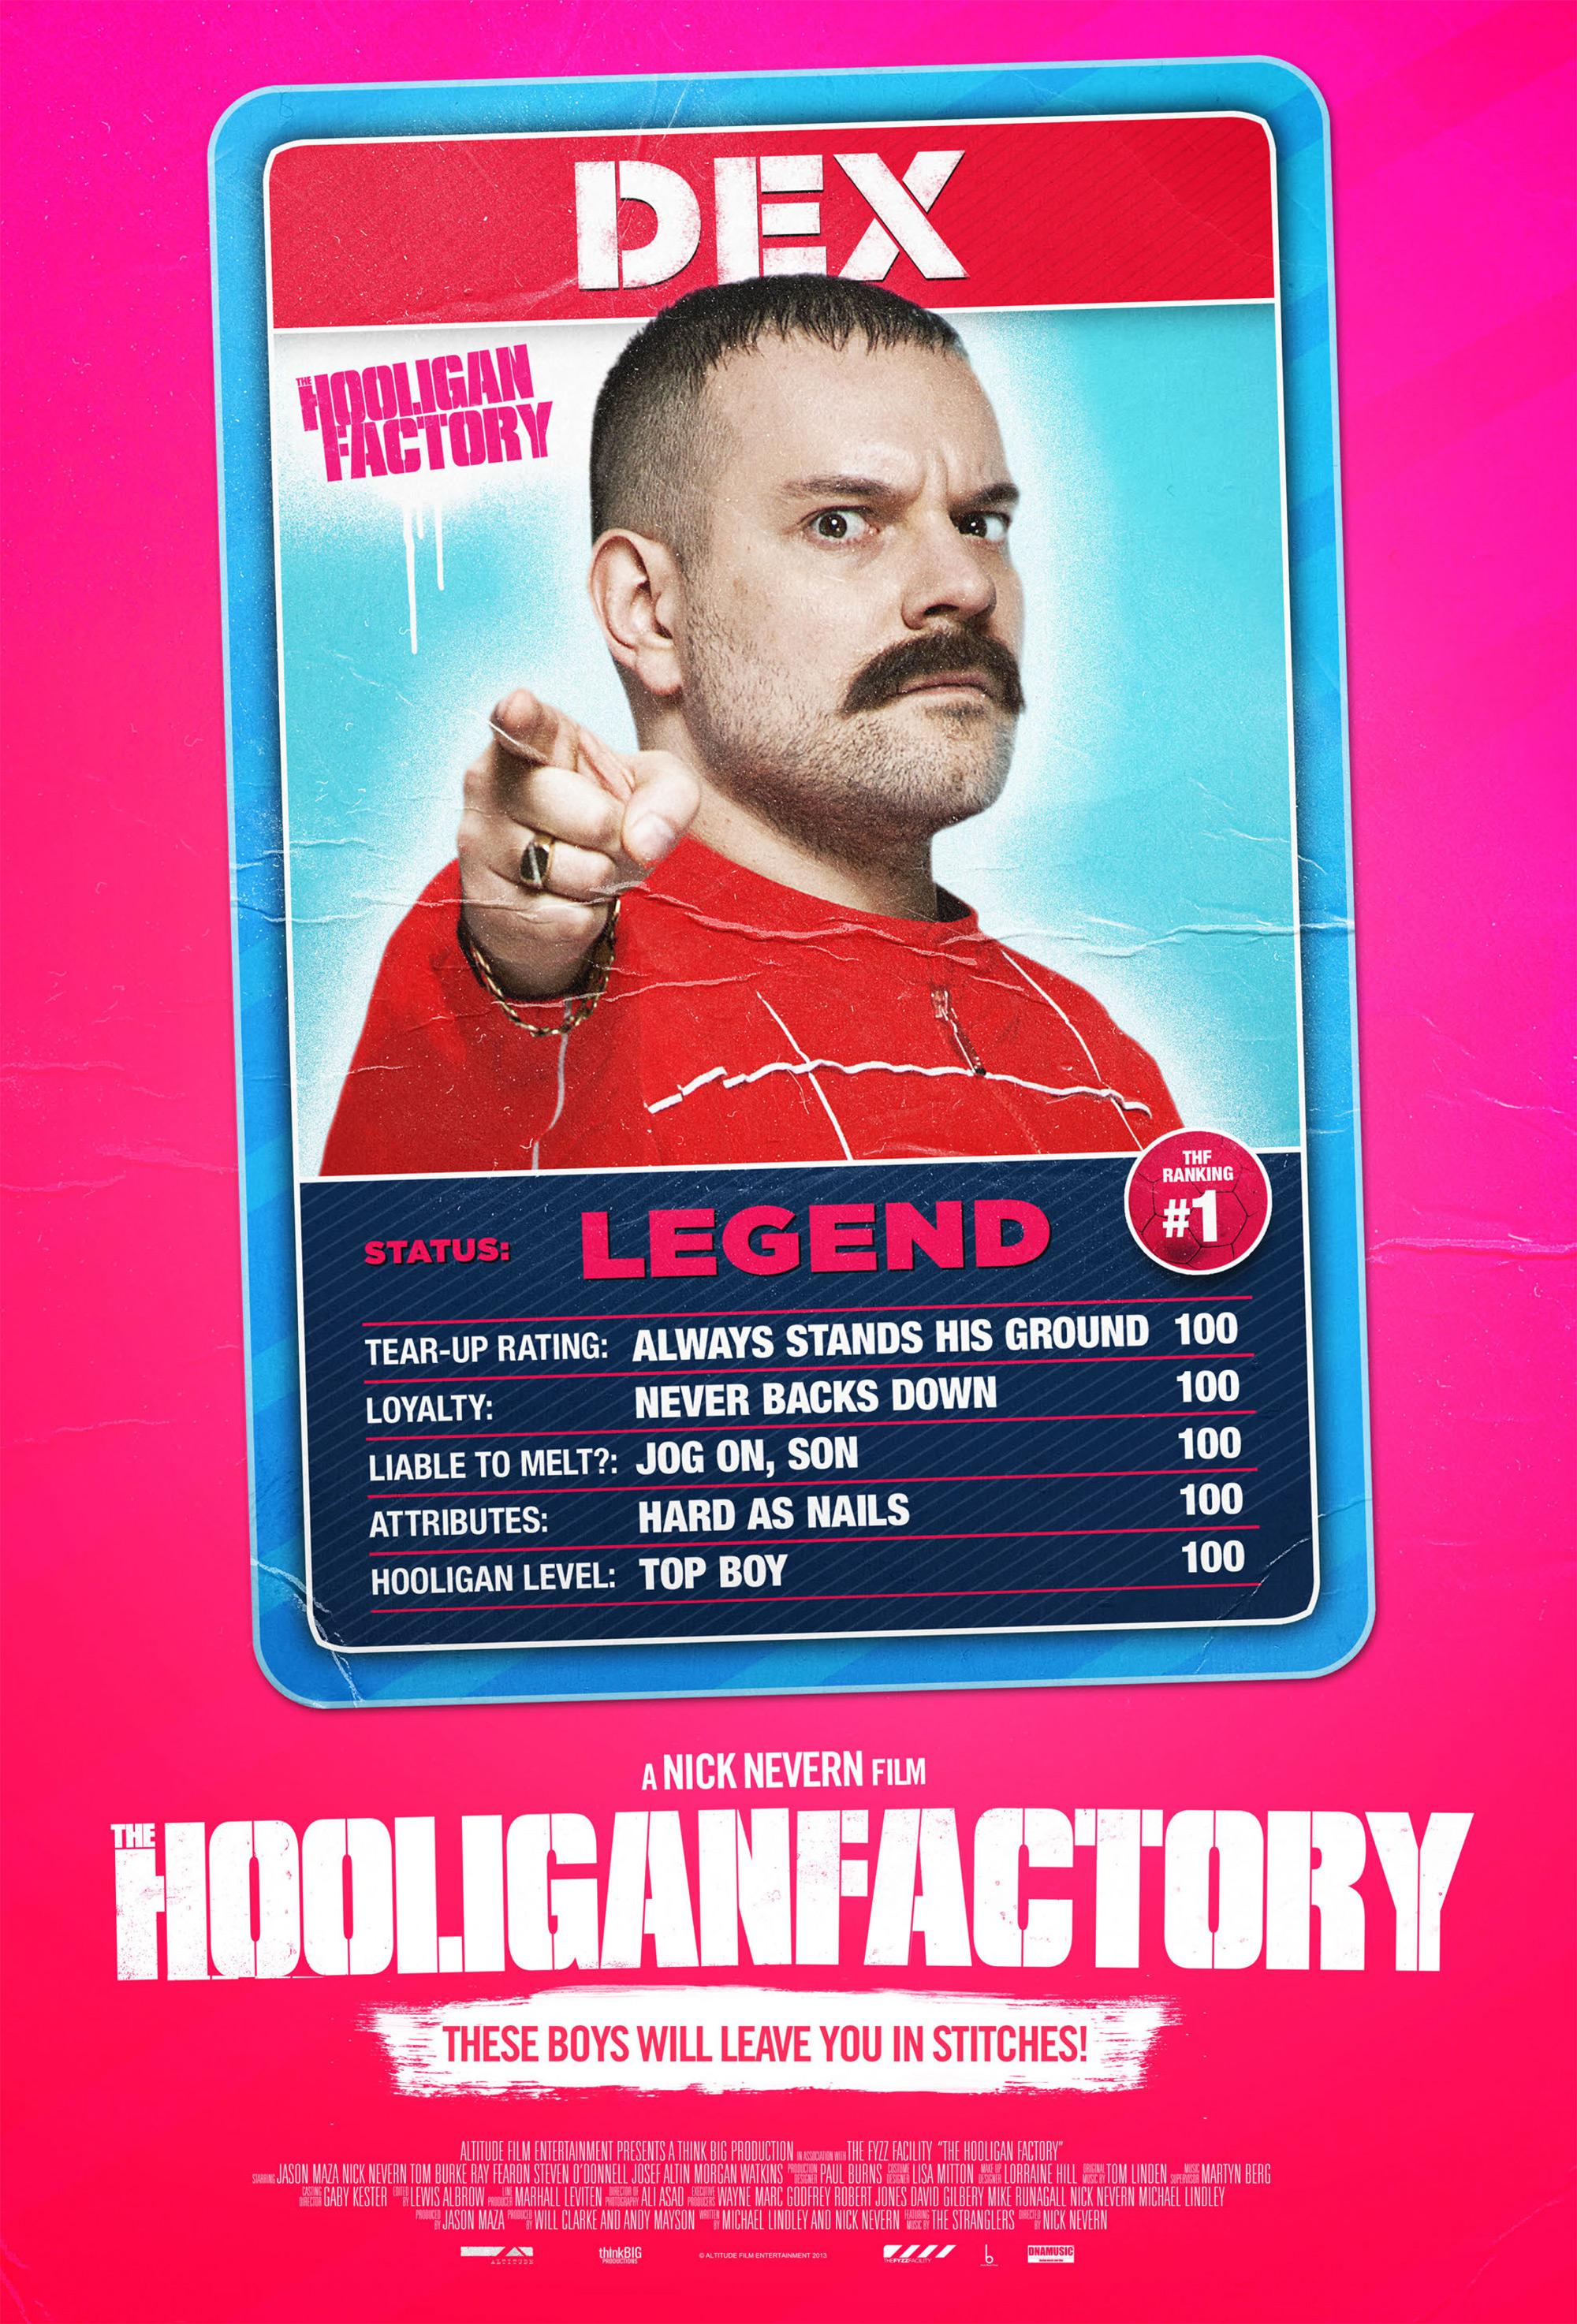 The Hooligan Factory The Hooligan Factory Posters